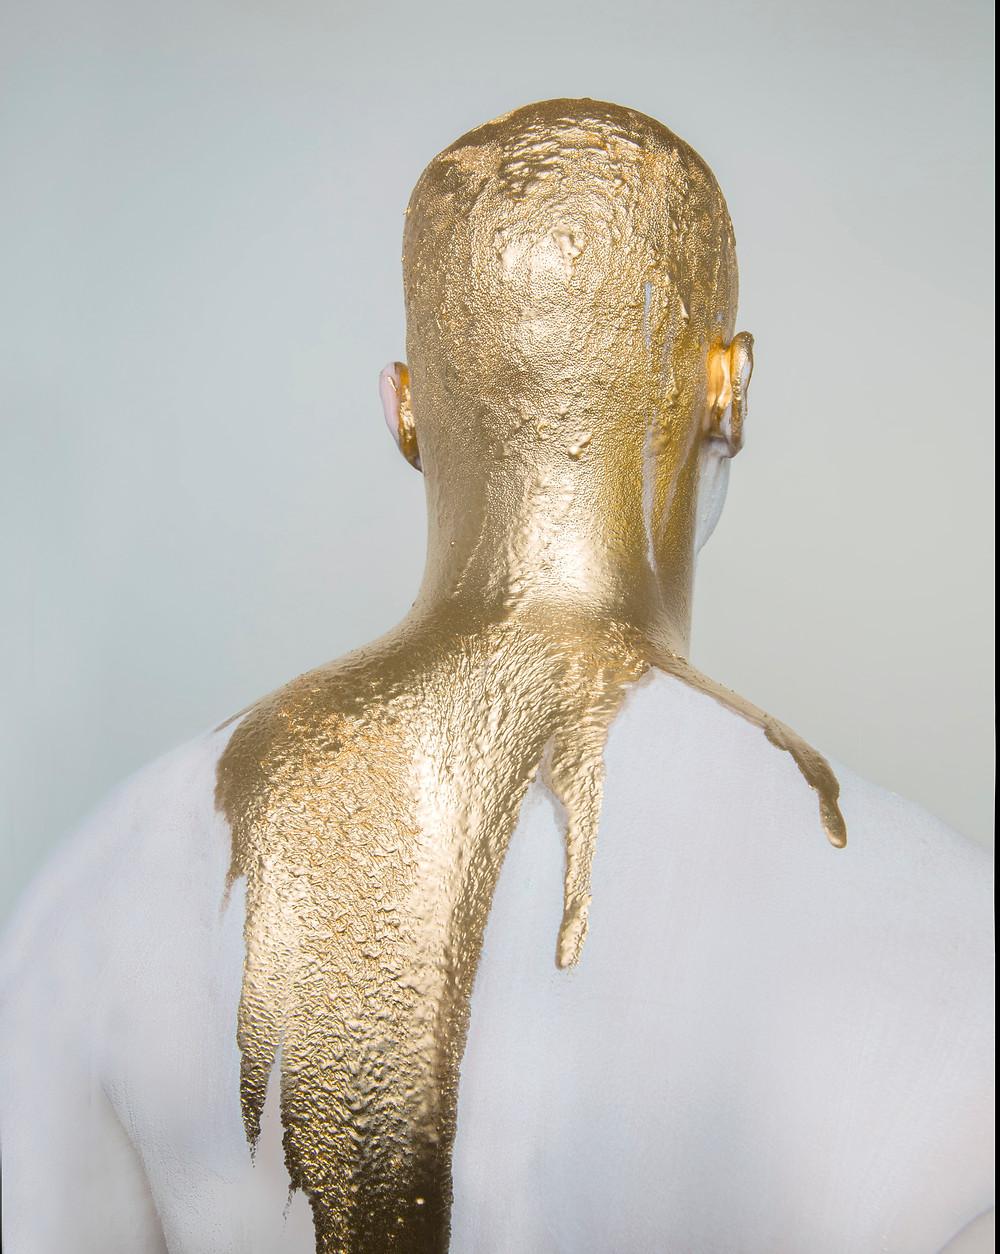 Photographer Lara Zankoul artistic shot of a man covered in liquid gold